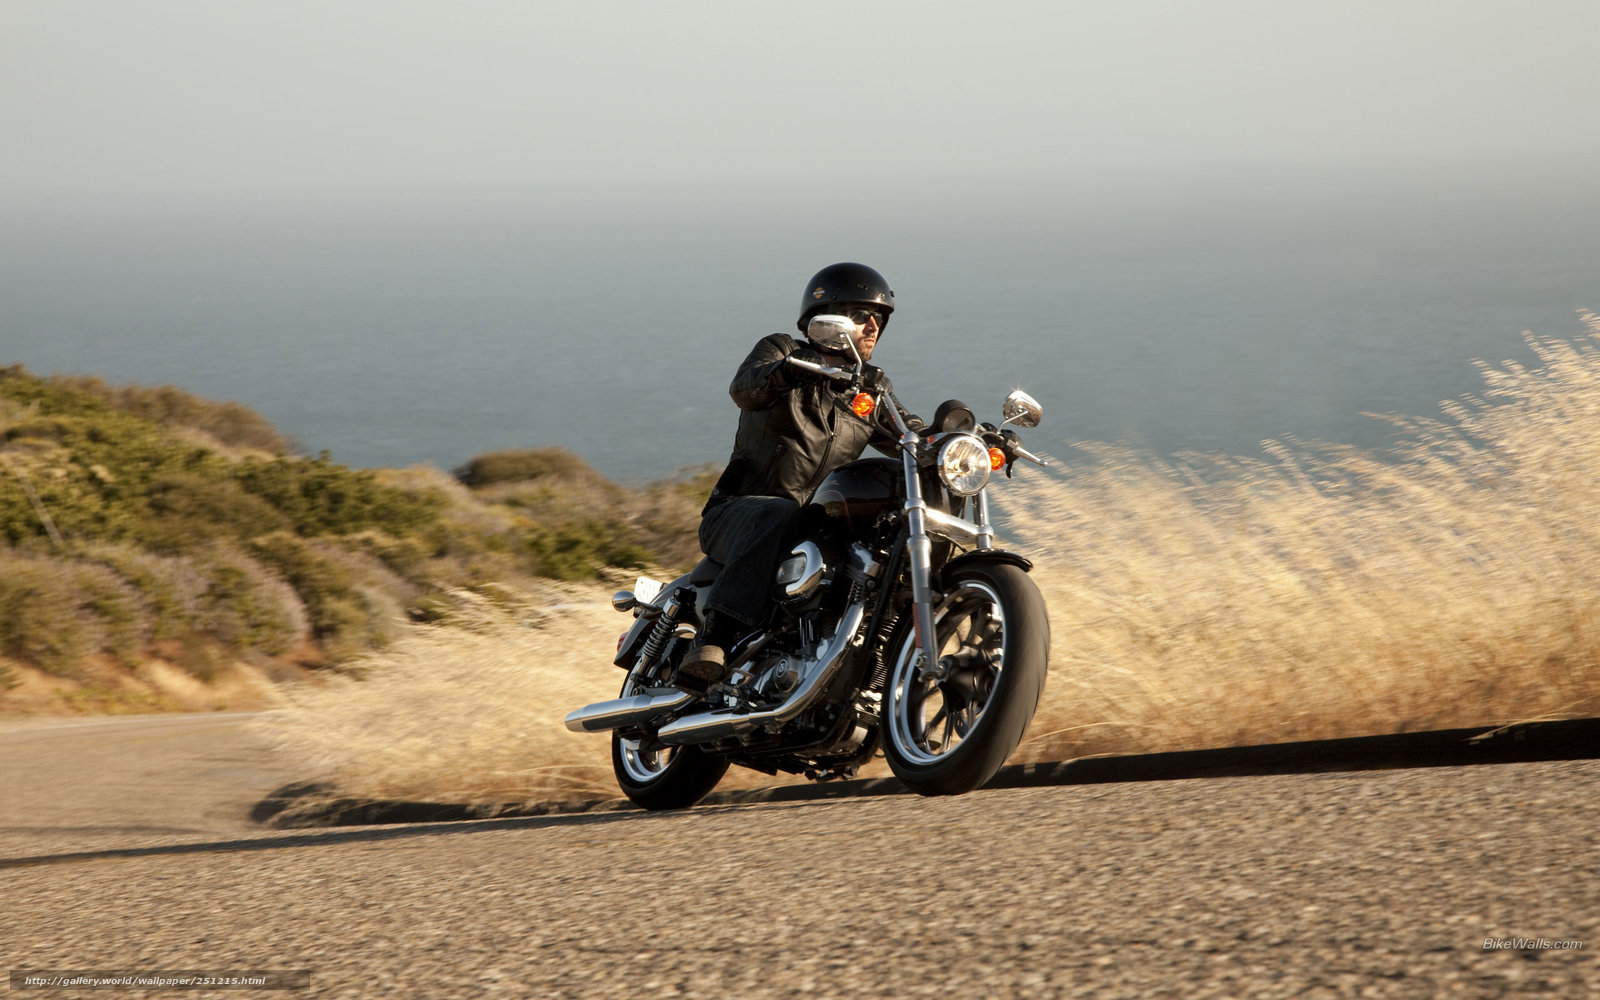 Download wallpaper Harley Davidson Sportster XL 883L 1600x1000